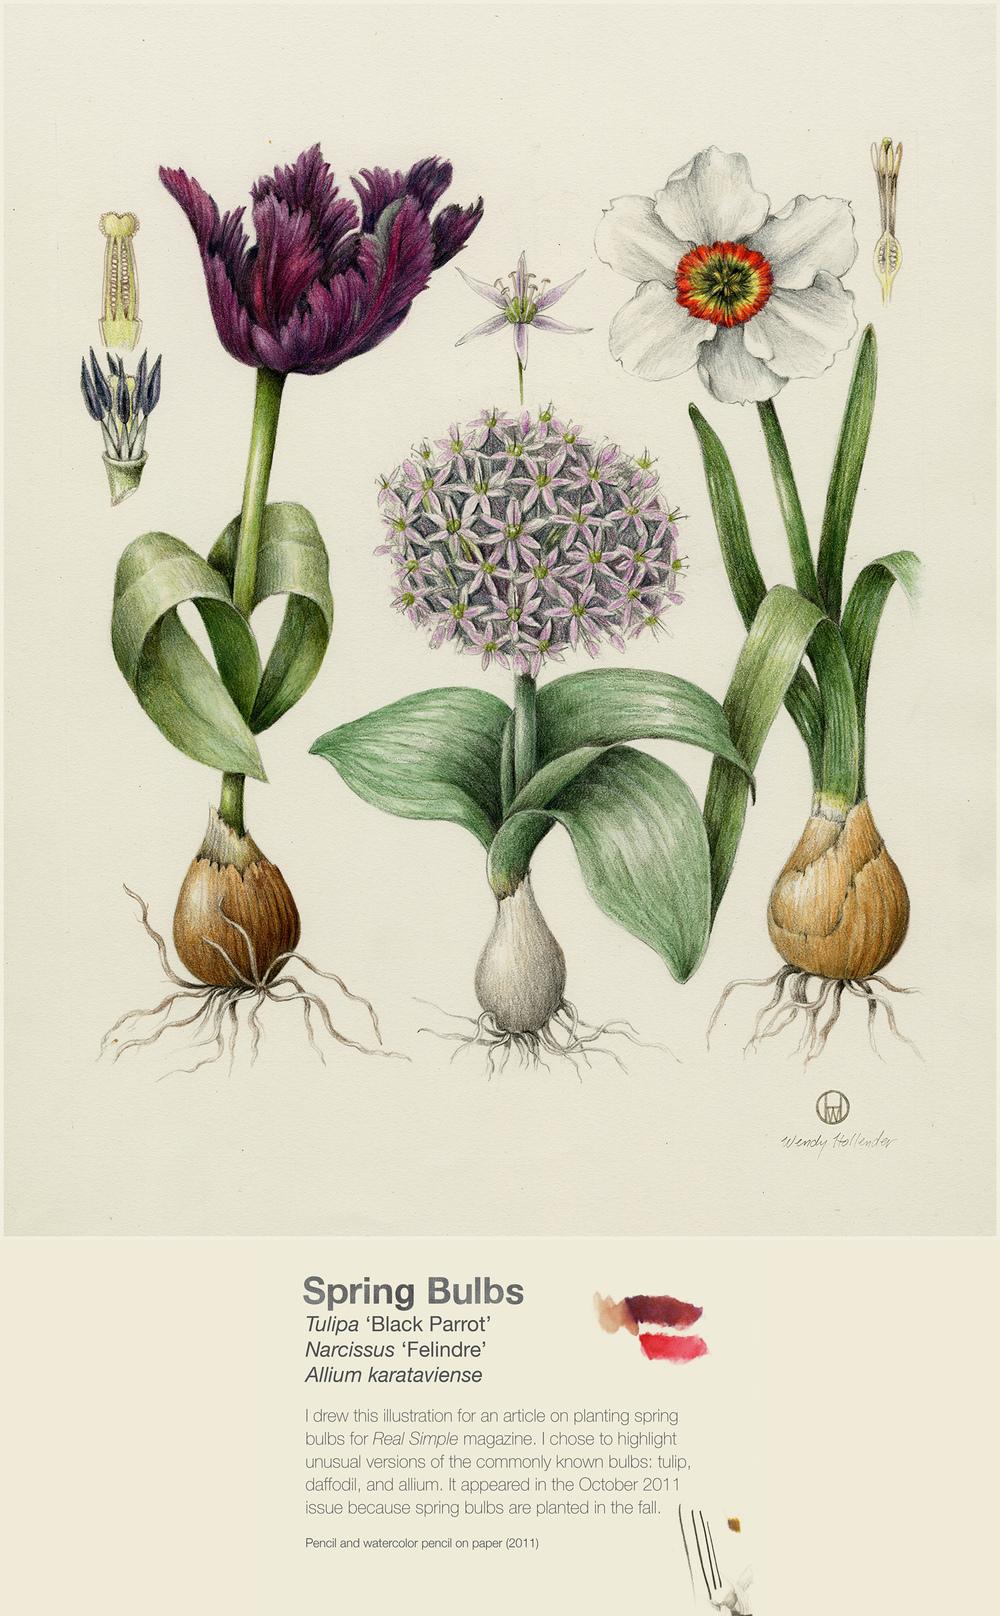 Spring Bulbs - Tulipa 'Black Parrot', Narcissus 'Felindre', Allium karataviense